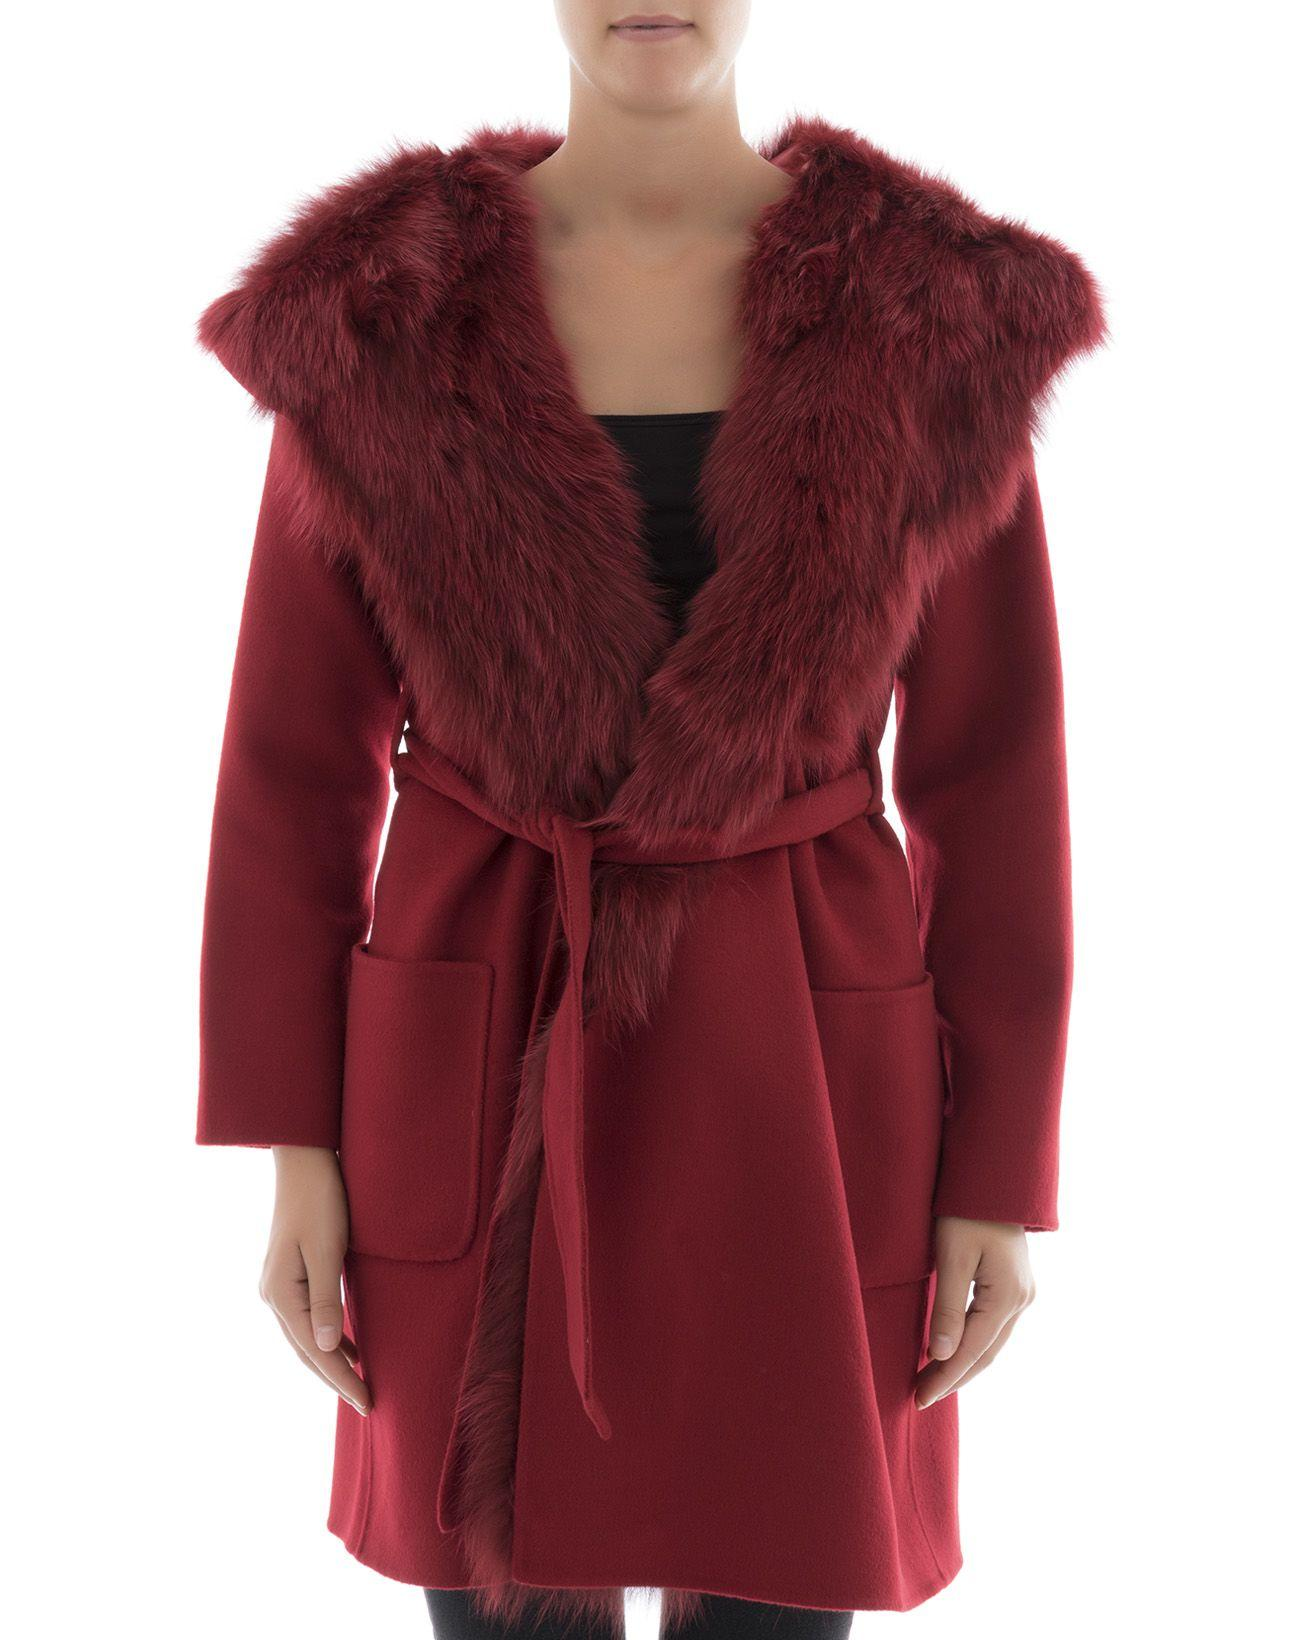 Parosh Red Wool Coat